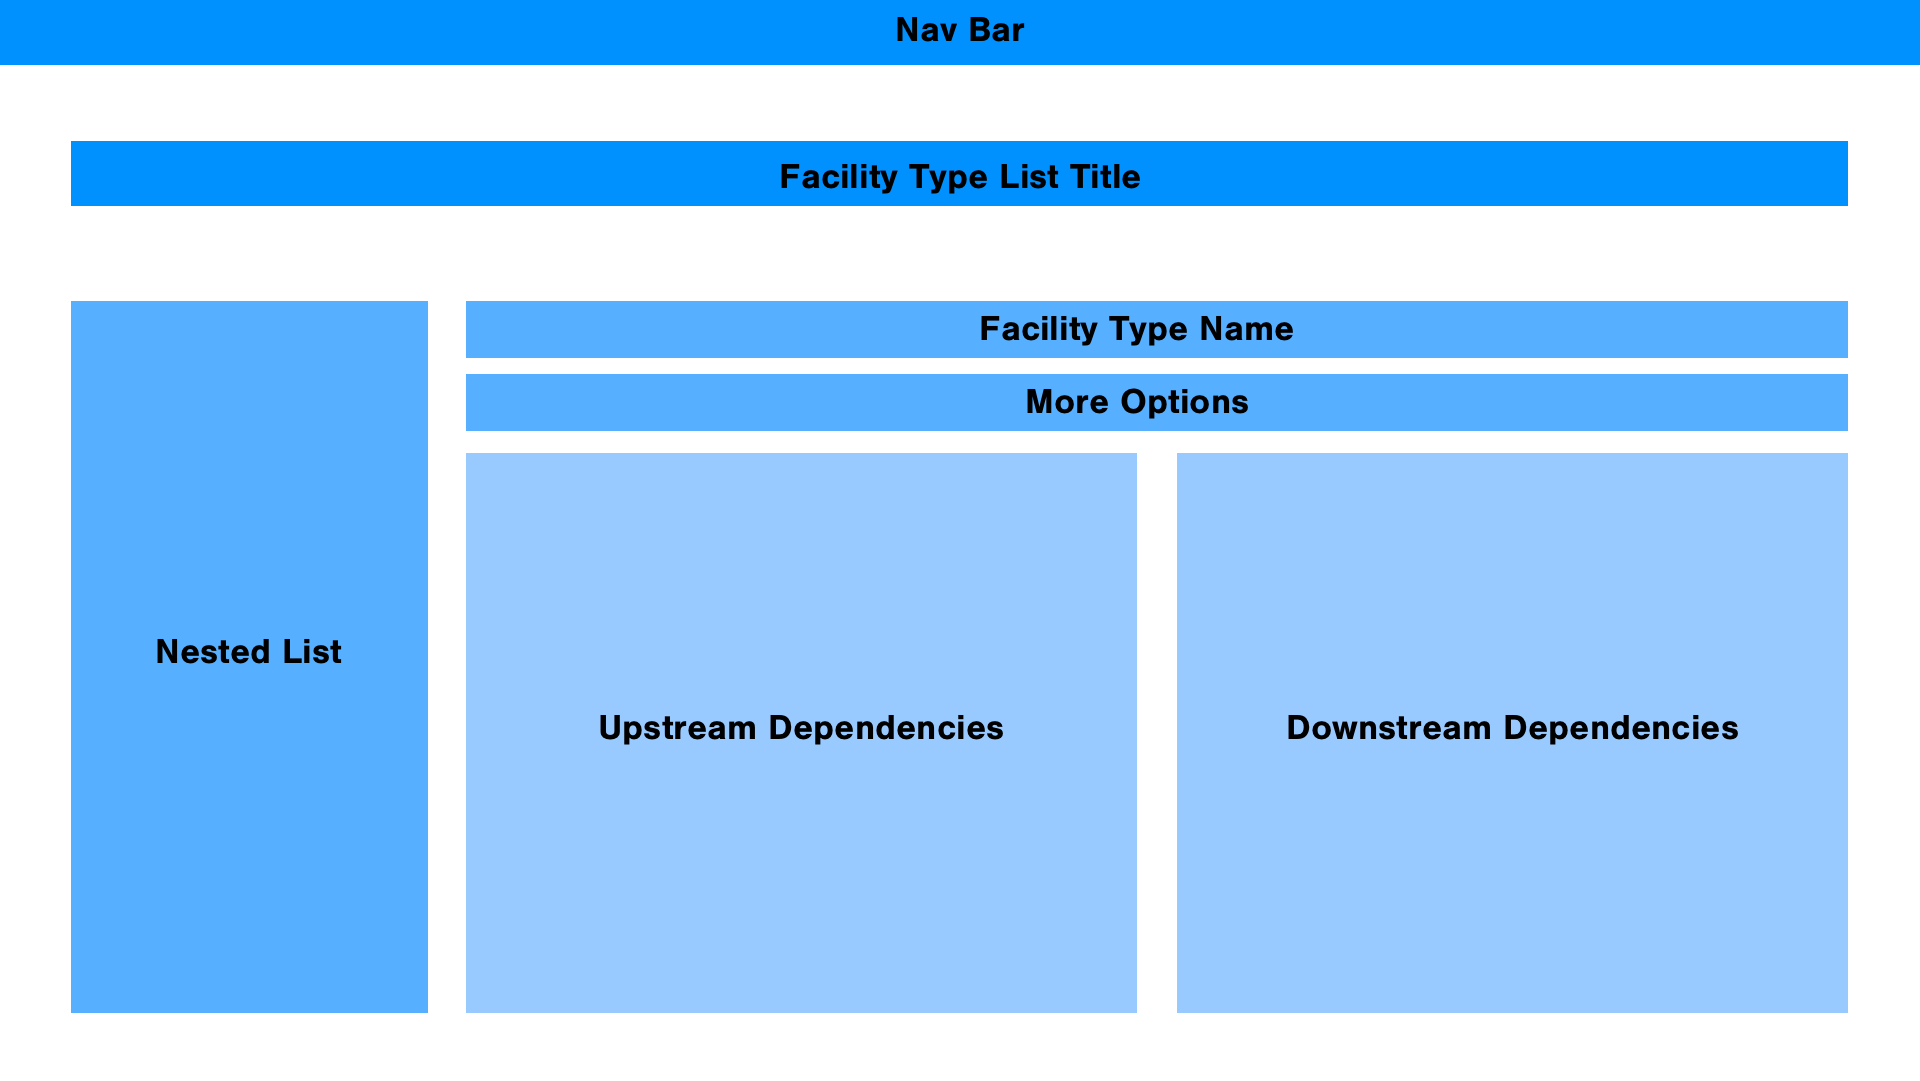 Facility Type List